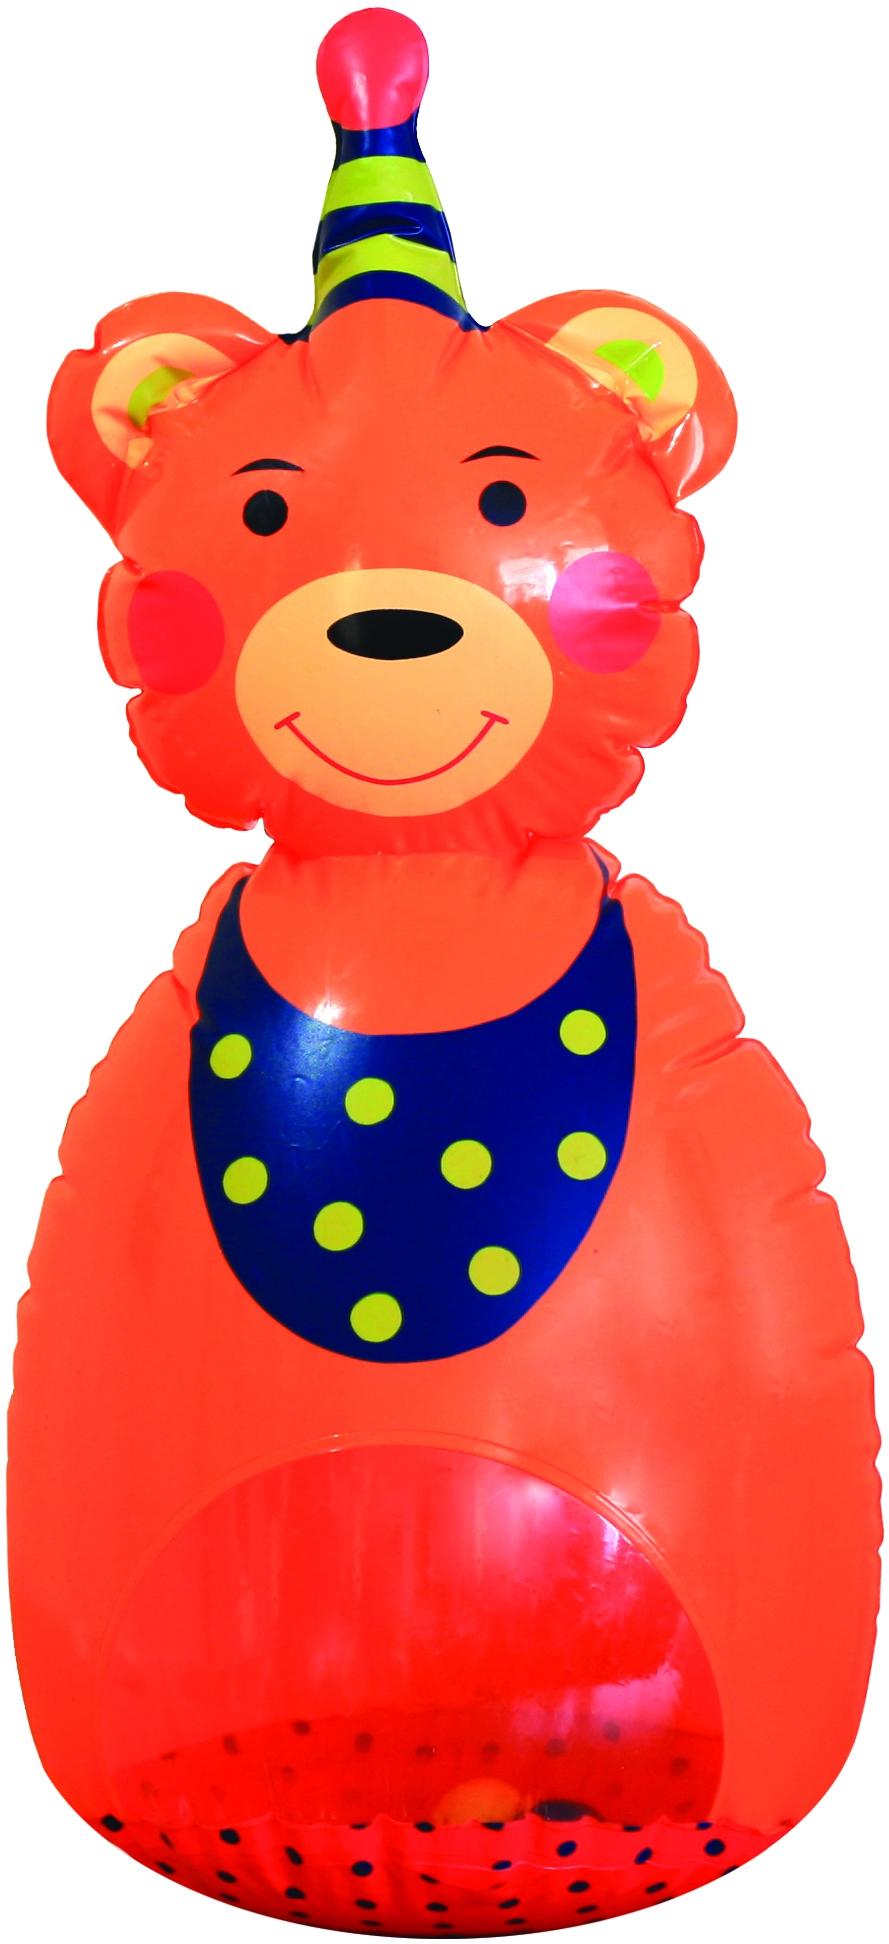 Неваляшки для малышей LUBBY Мишутка-Неваляшка мягкие игрушки spiegelburg мишка неваляшка baby gluck